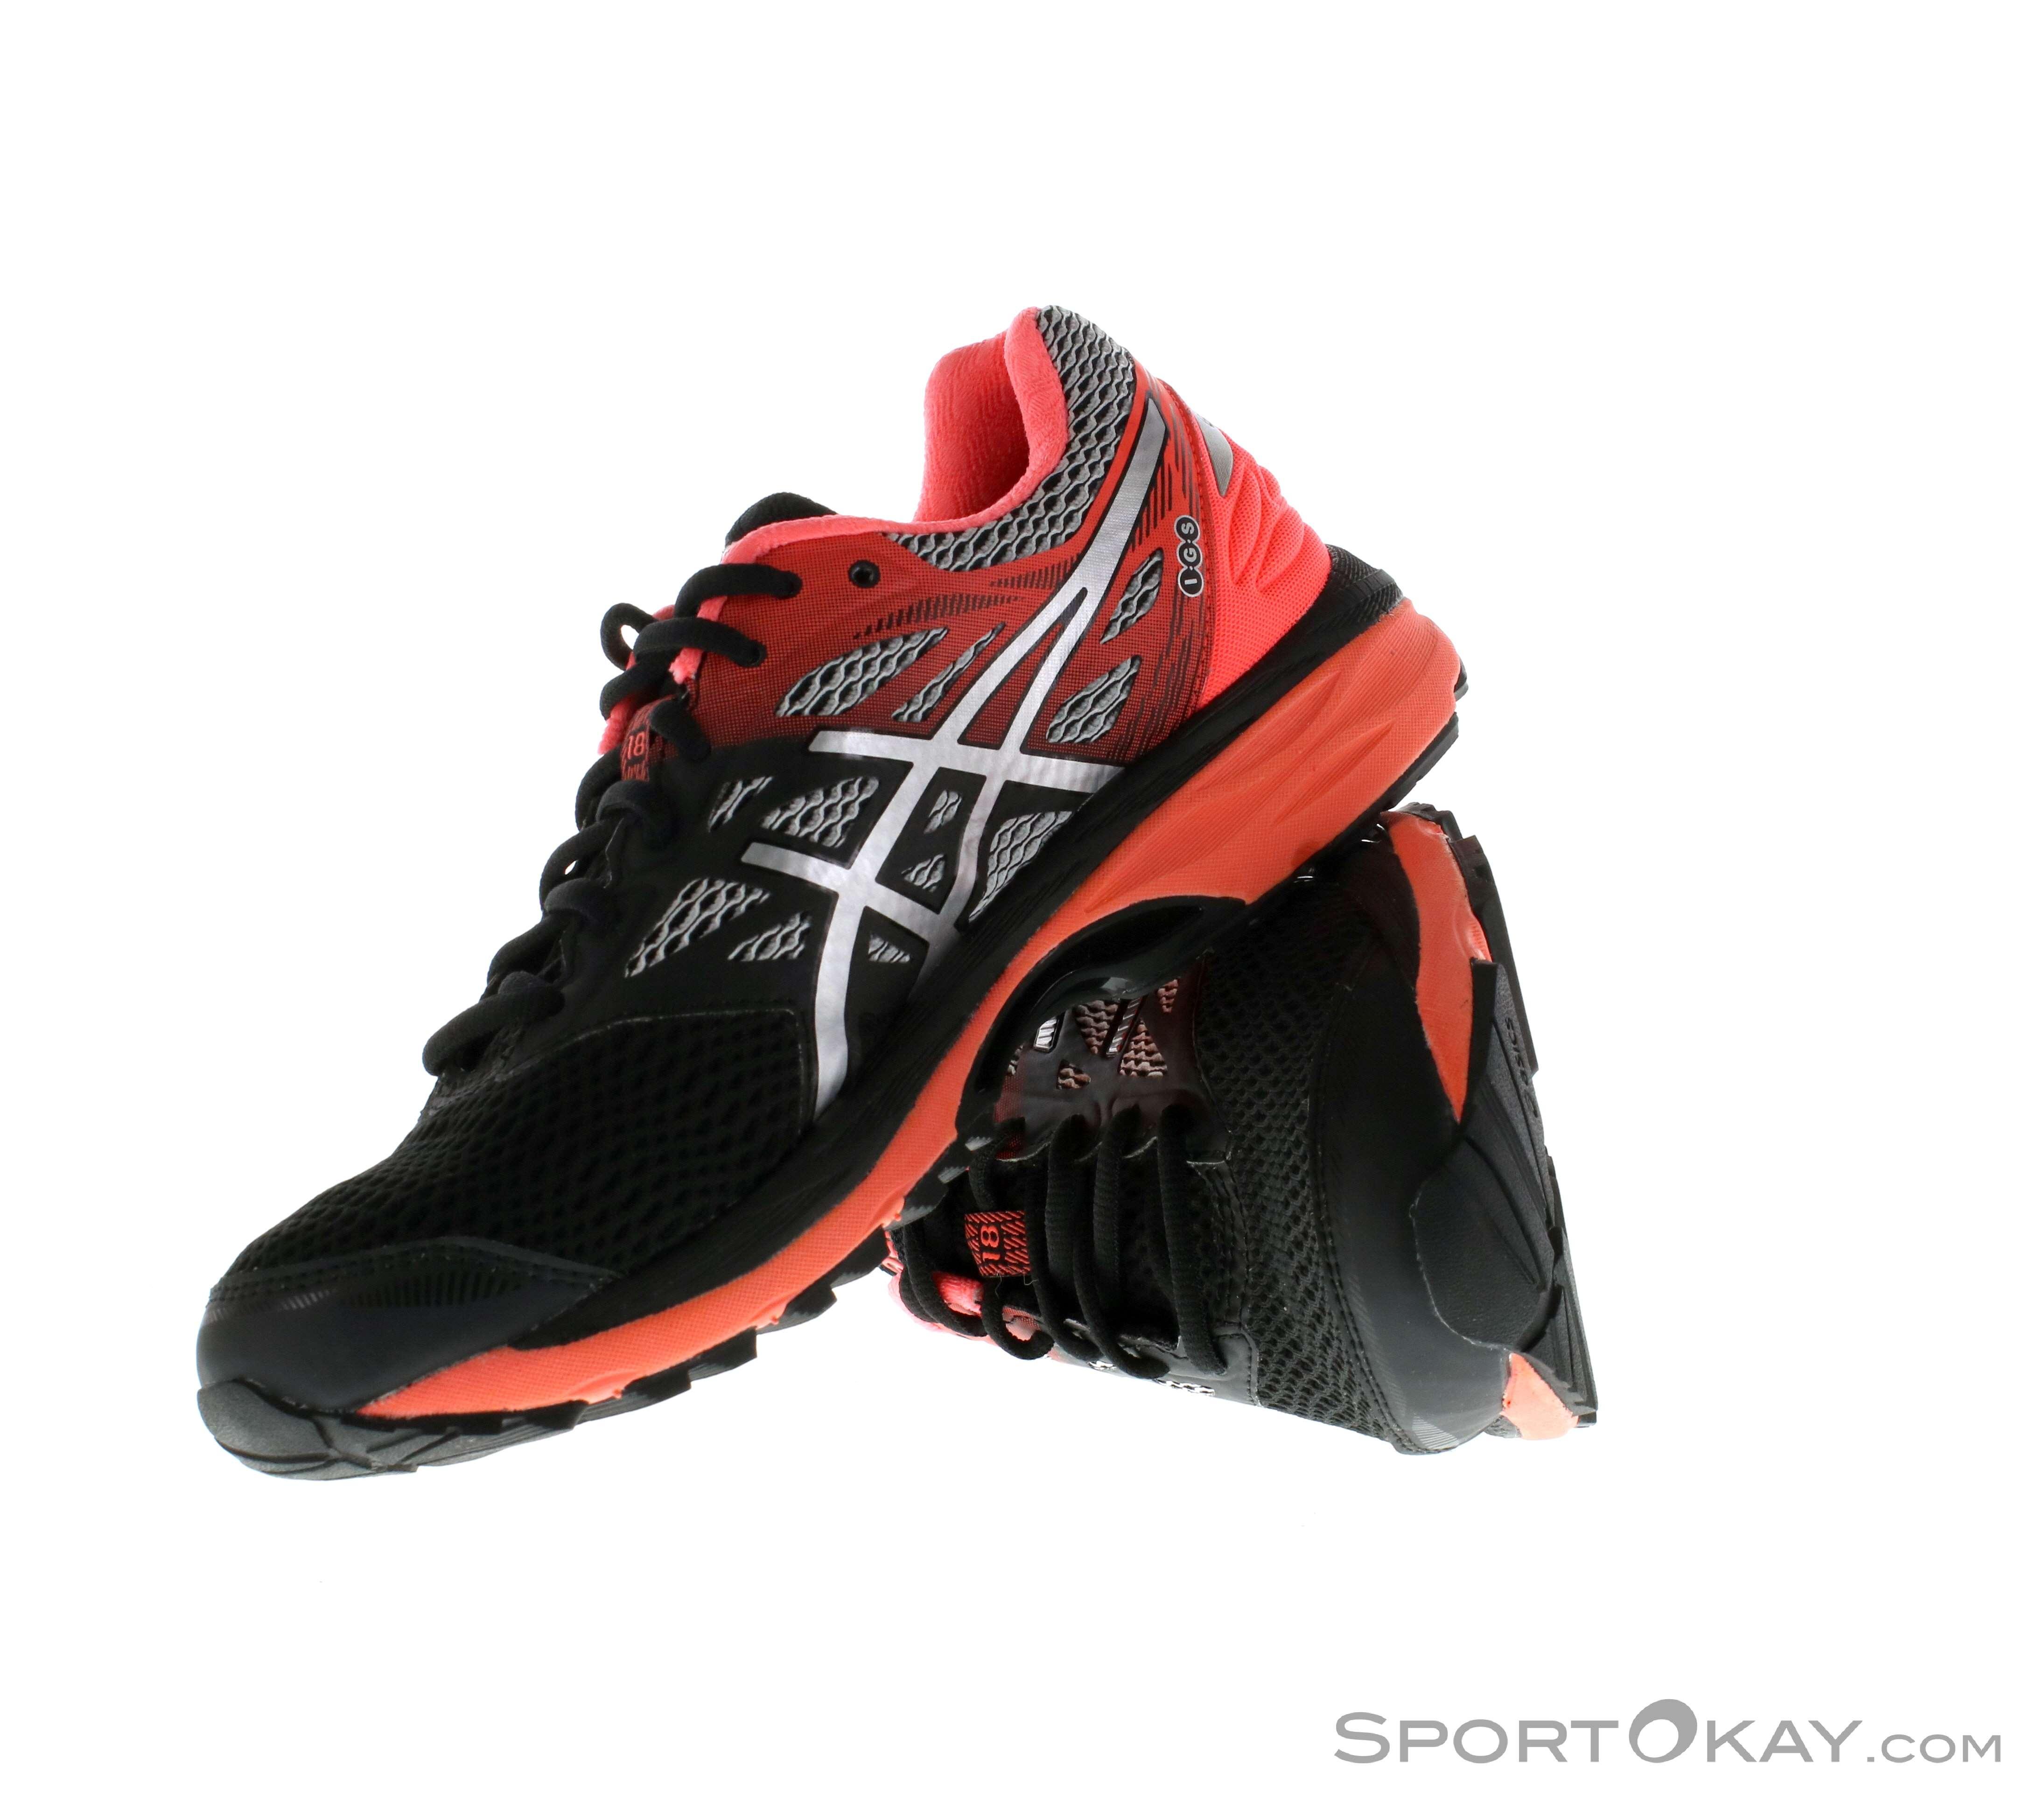 Asics Gel Cumulus 18 GTX Mens Running Shoes Gore-Tex, Asics, Black,